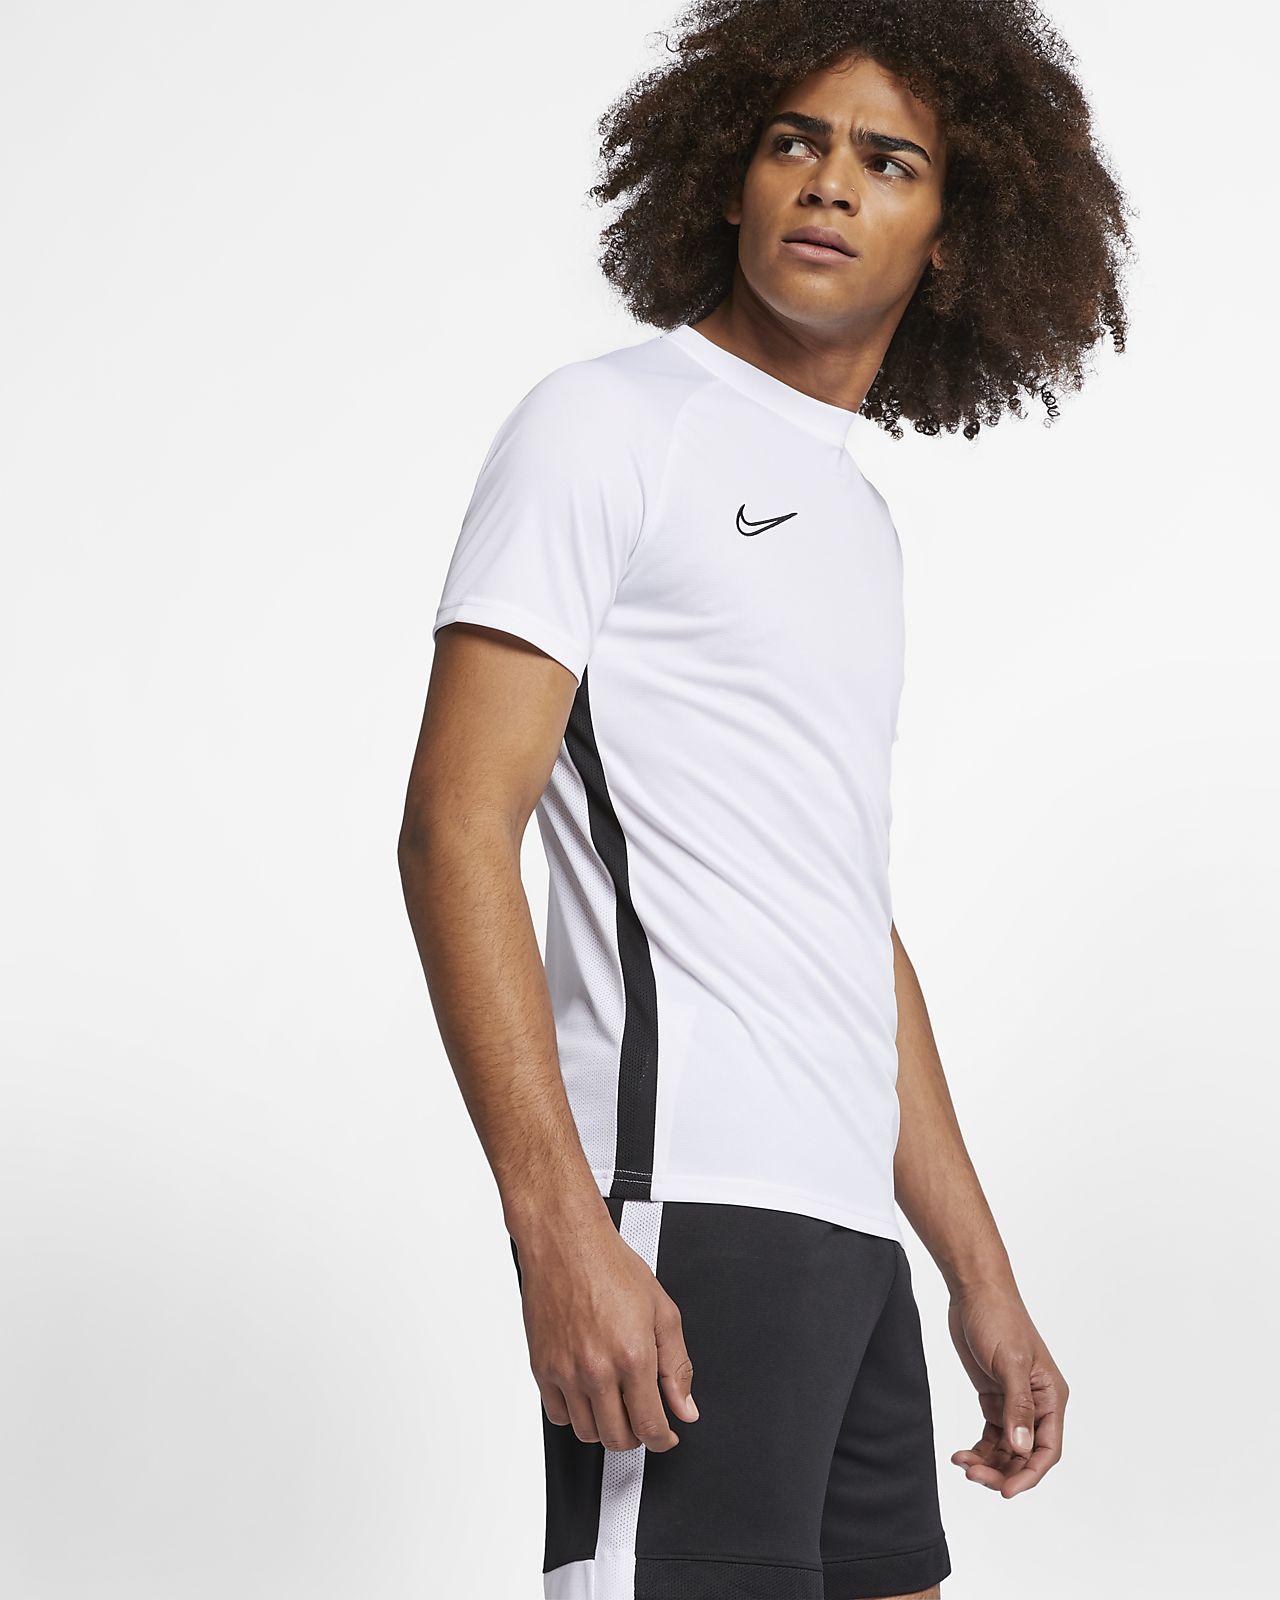 Nike Dri-FIT Academy Men's Soccer Short-Sleeve Top